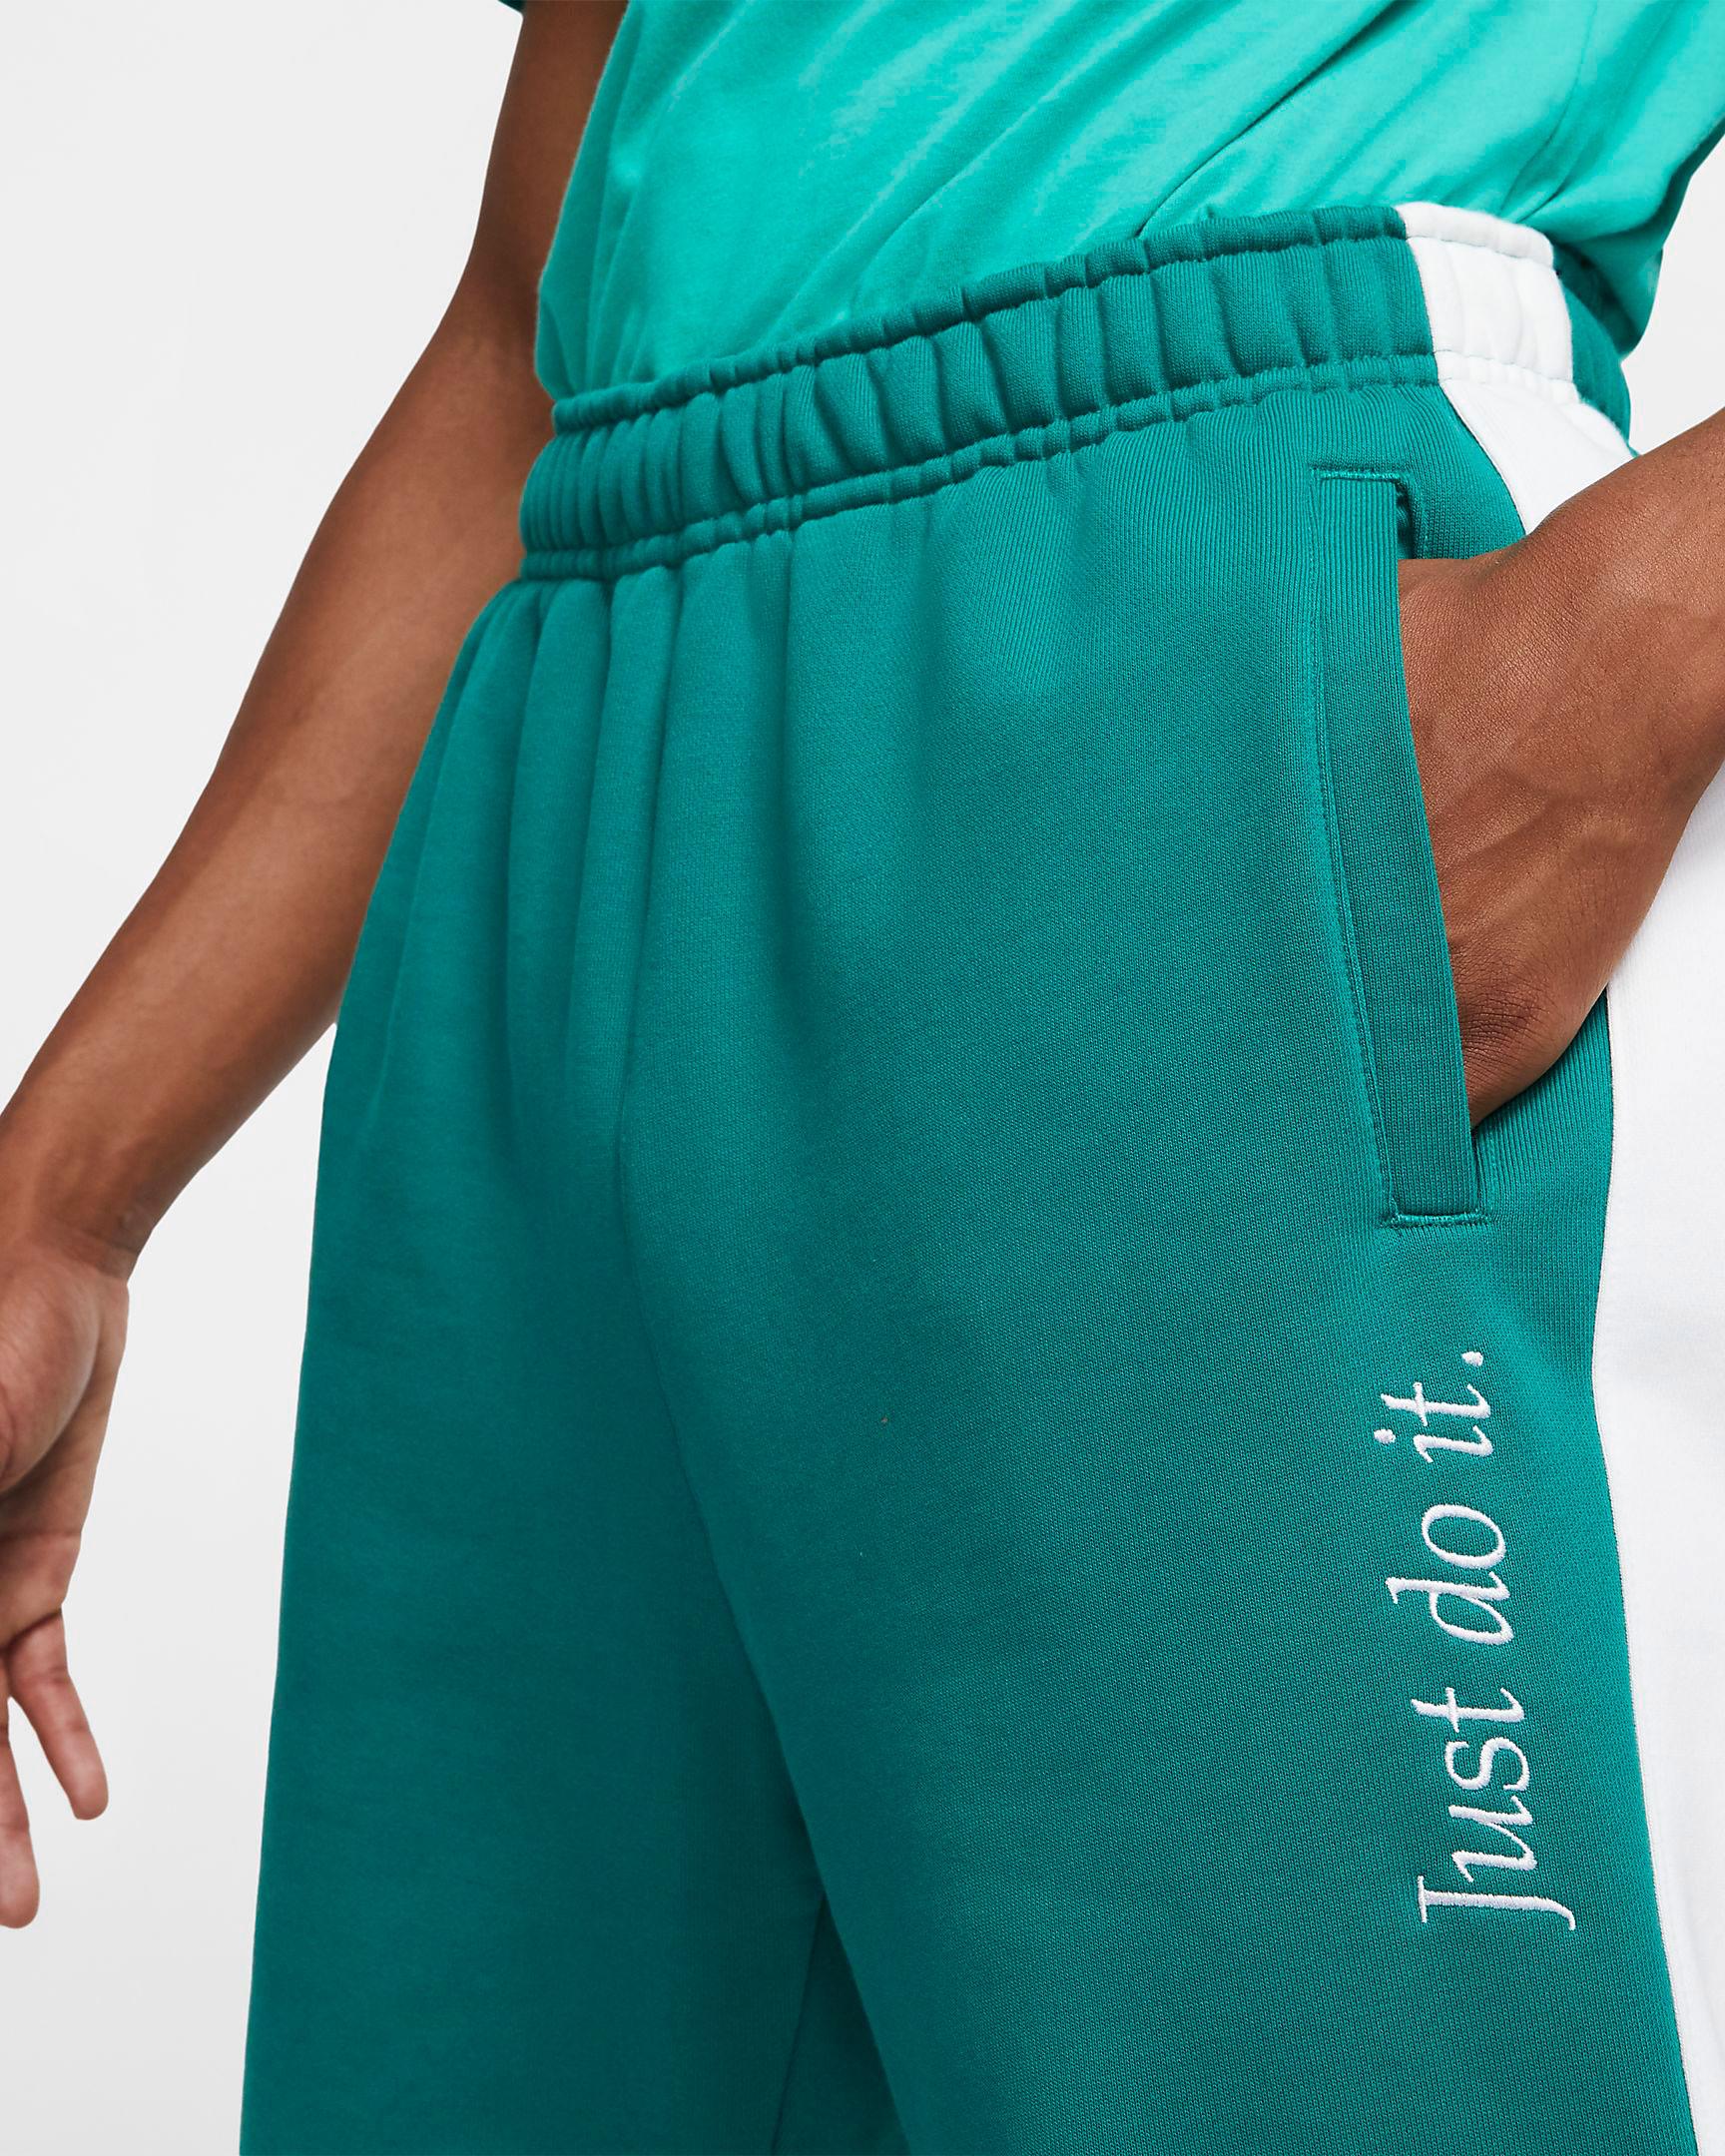 nike-island-green-just-do-it-jogger-pants-2